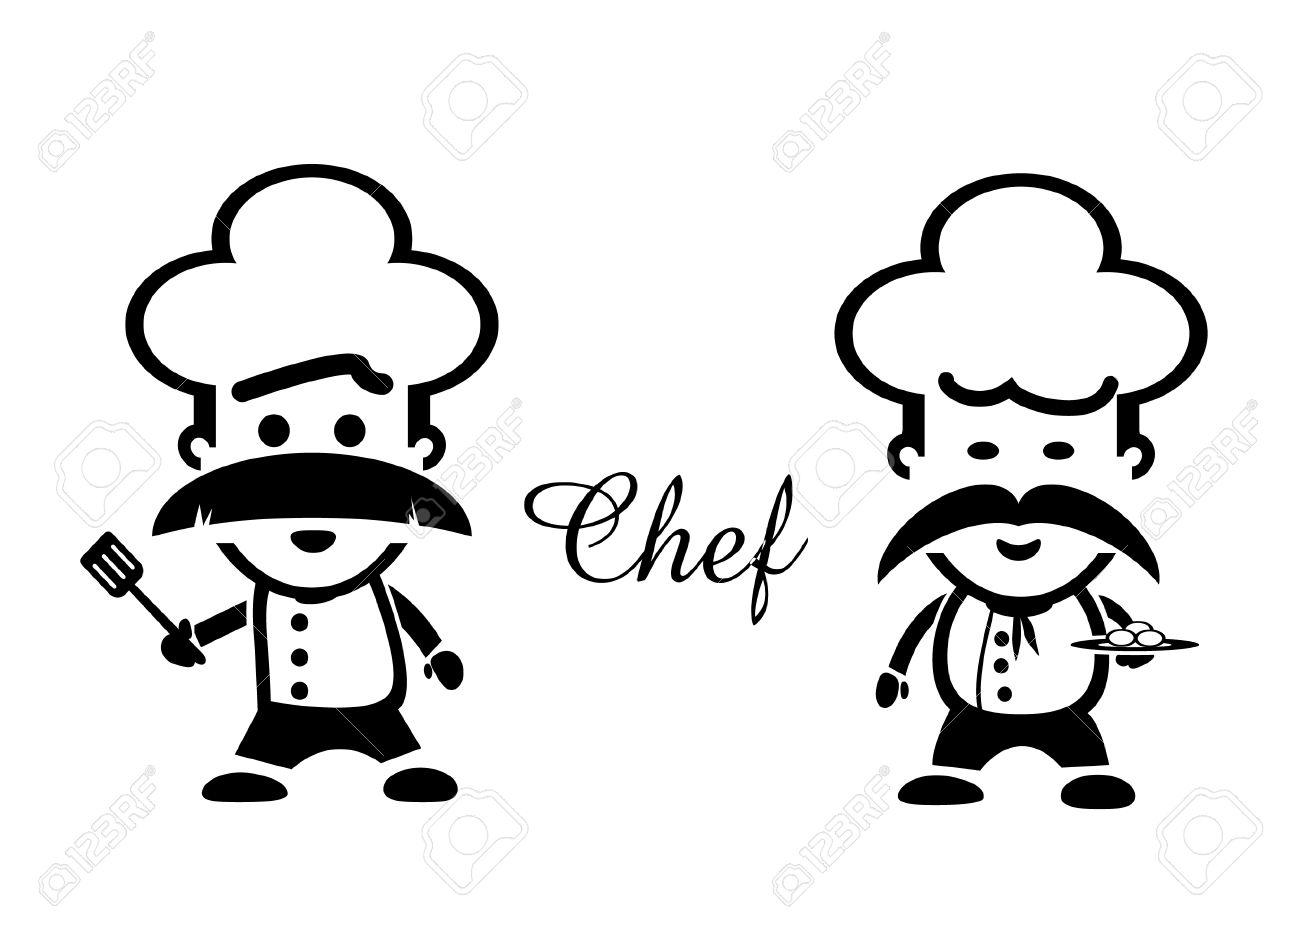 chef vector art royalty free cliparts vectors and stock rh 123rf com royalty free vector art of horseshoe royalty free vector art of horseshoe